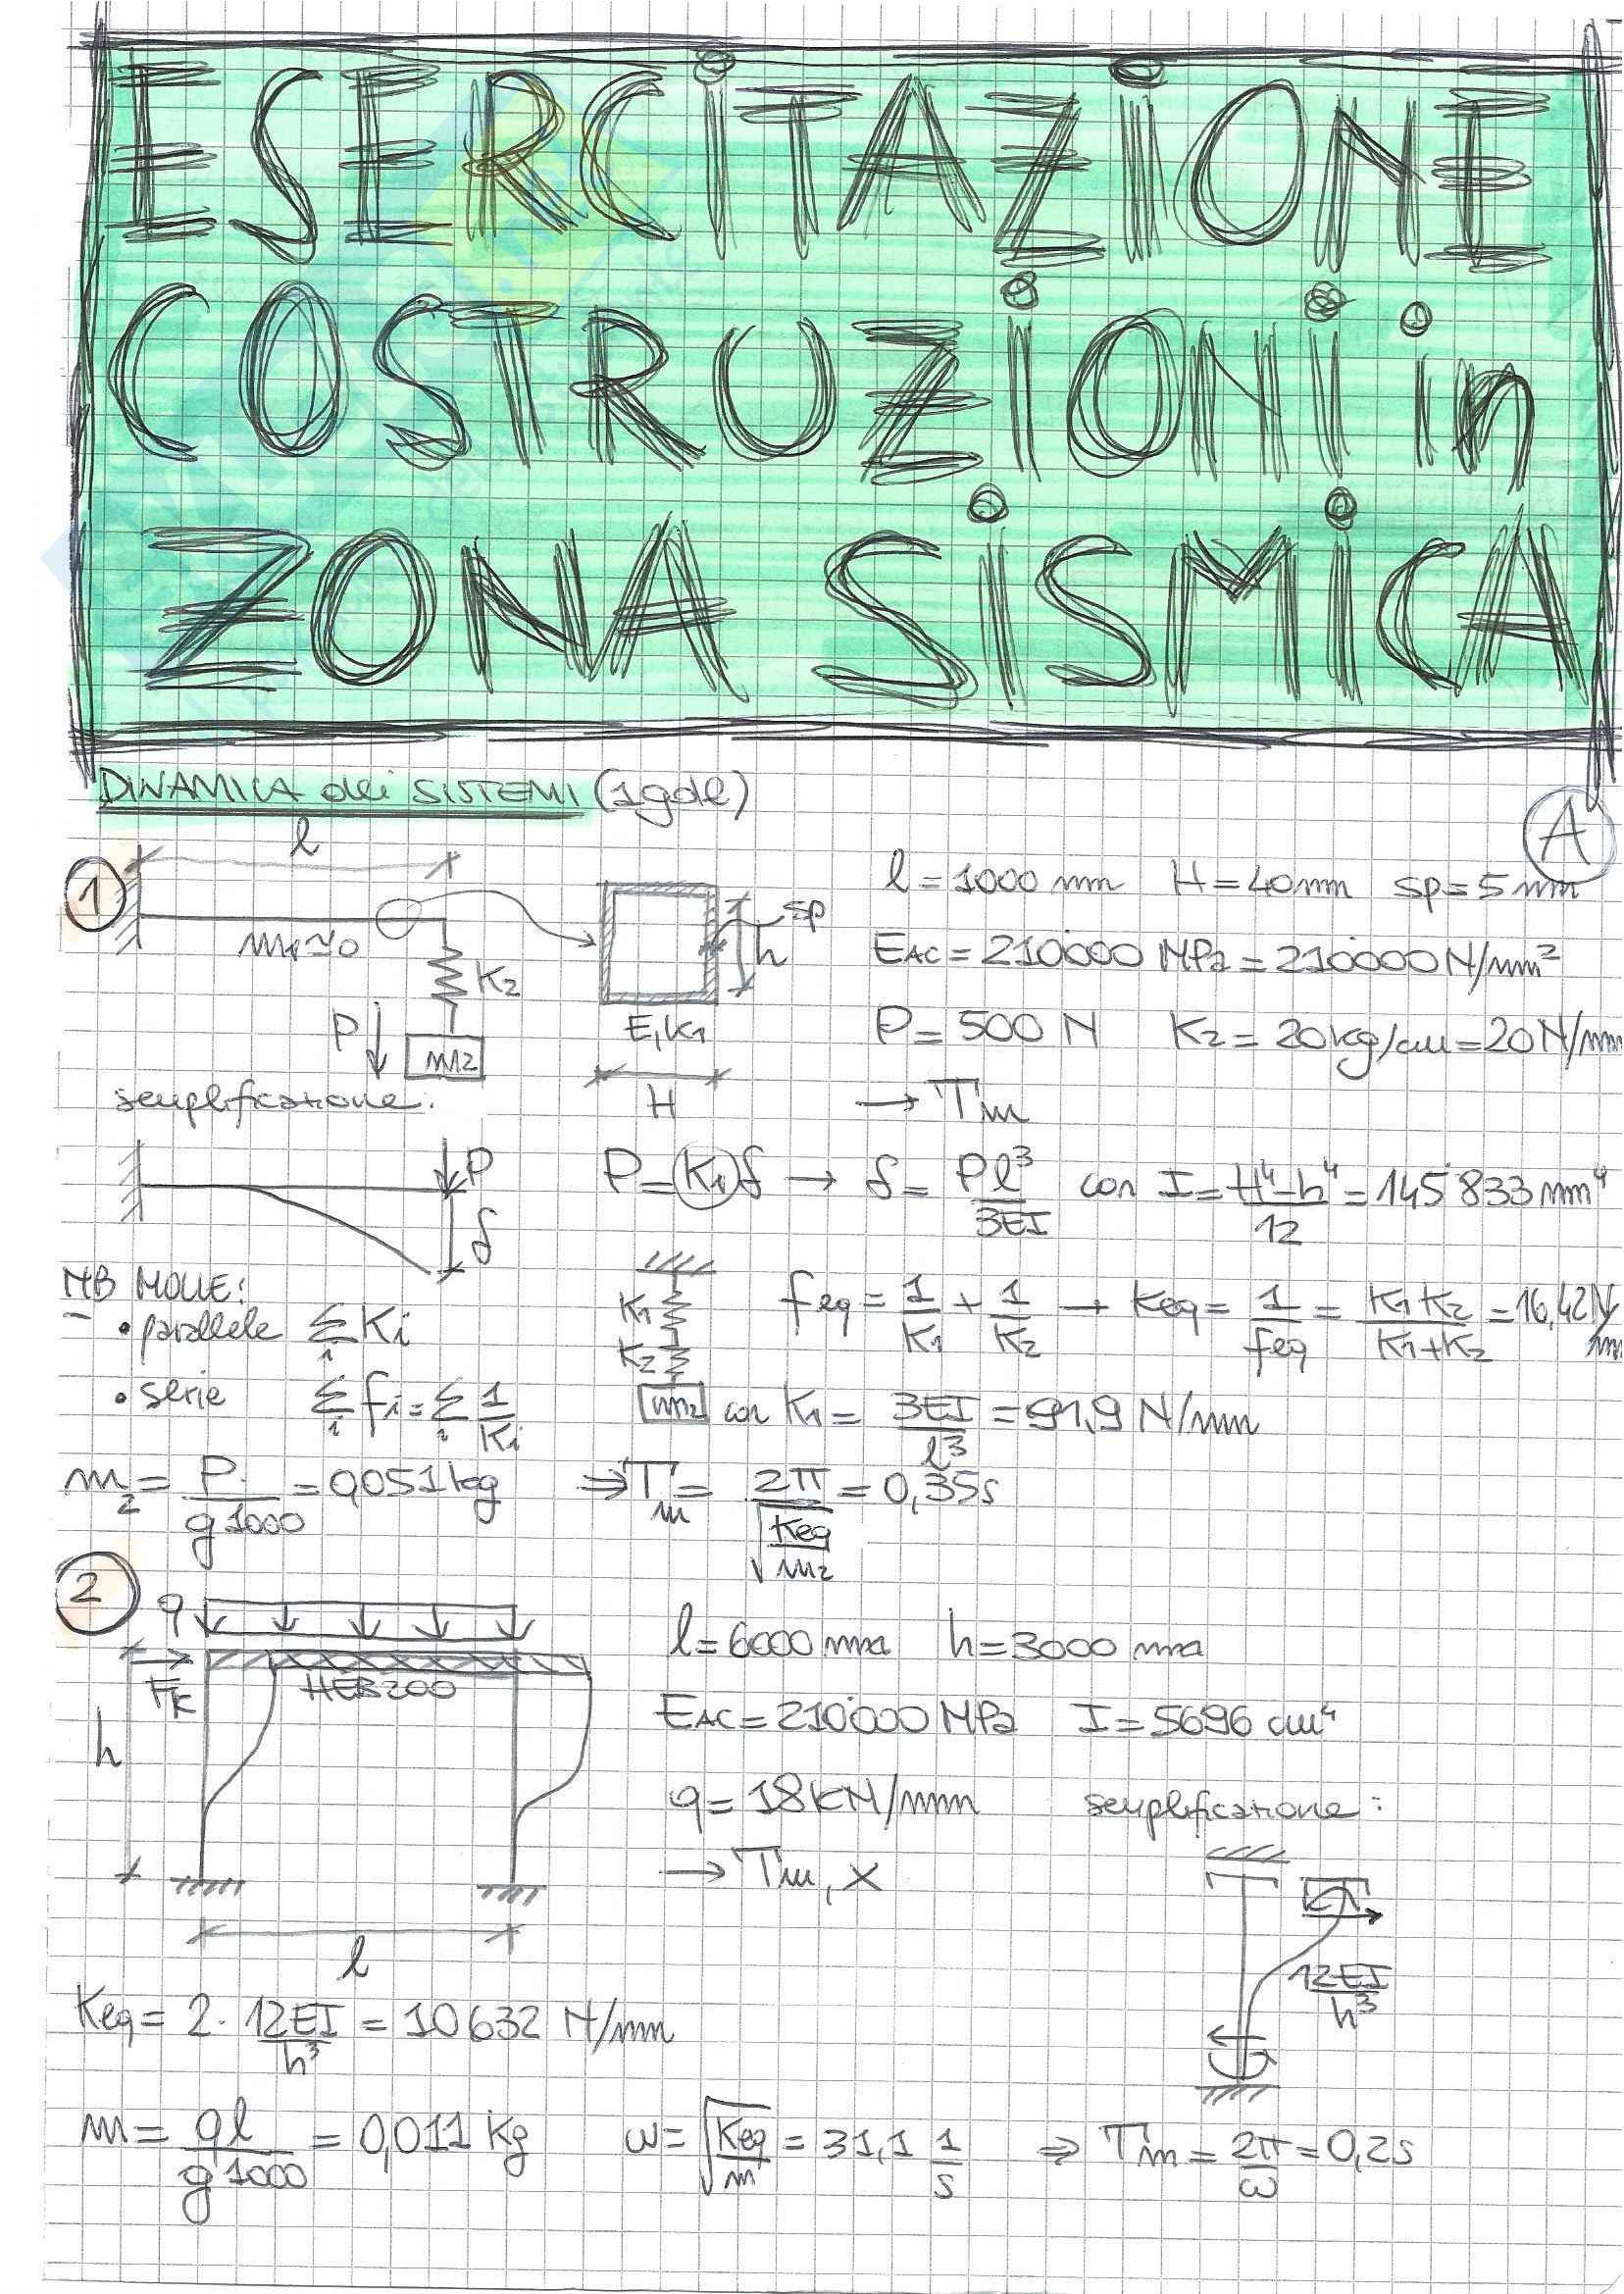 Costruzioni In Zona Sismica - Esercizi